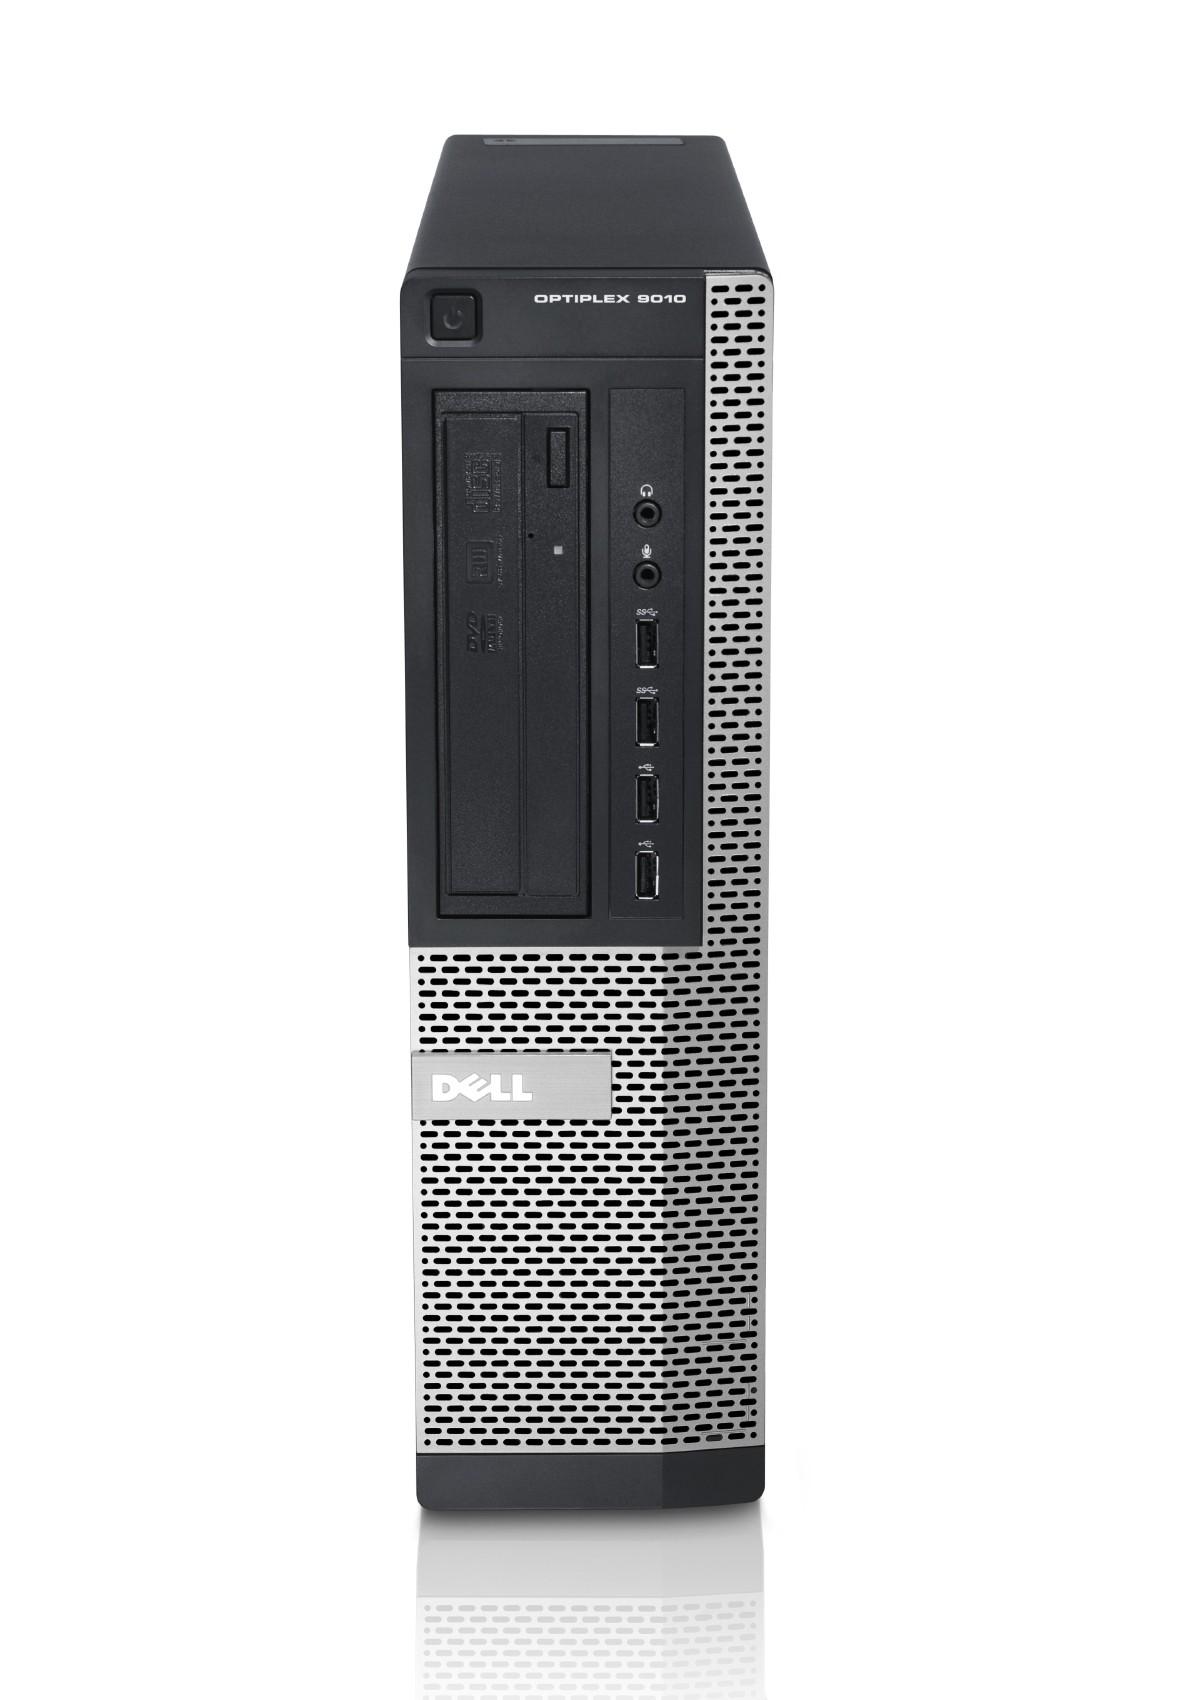 DELL-OPT-9010-i7-DT-Refurbished Dell OptiPlex 9010 DT Mini Tower Computer 1 TB HDD 16 GB RAM Windows 10-image